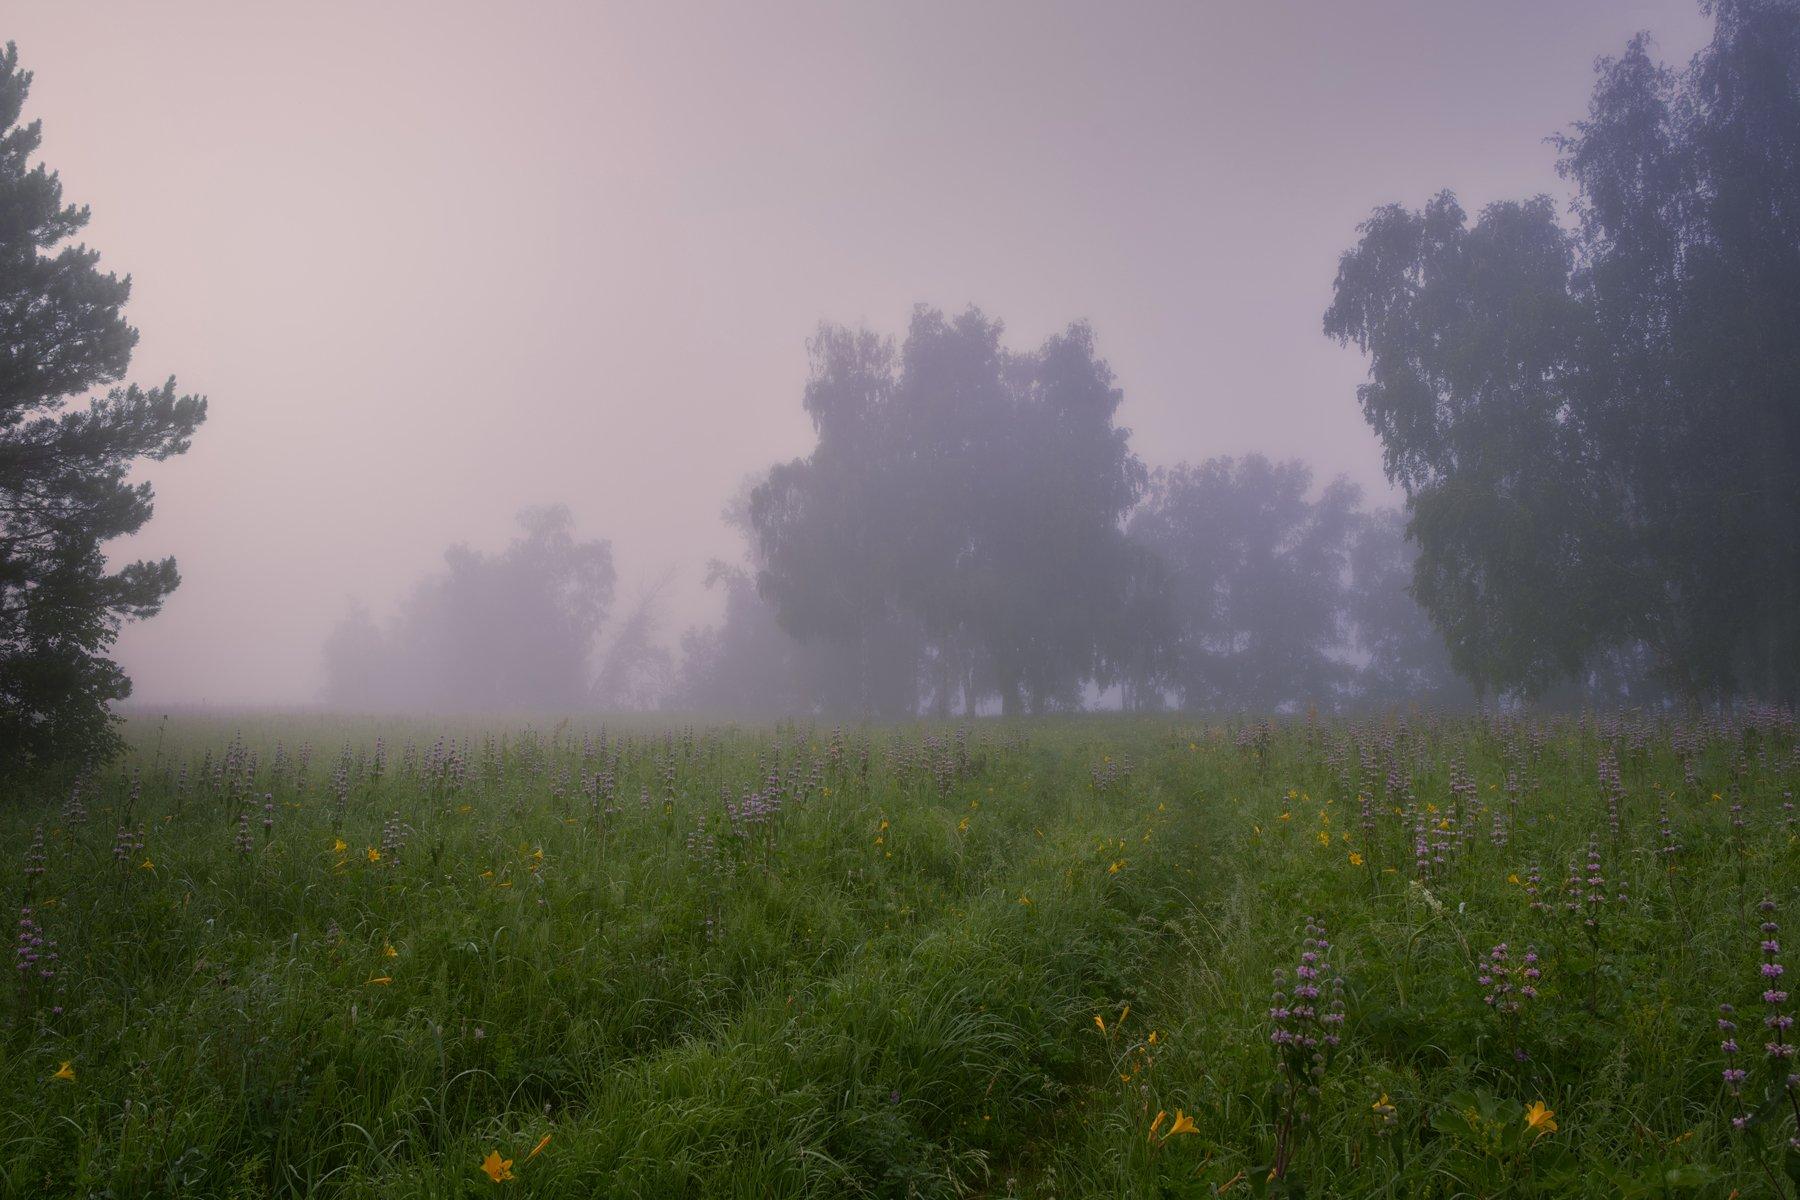 утро,туман,тишина,травы,луга,роса, Сергей